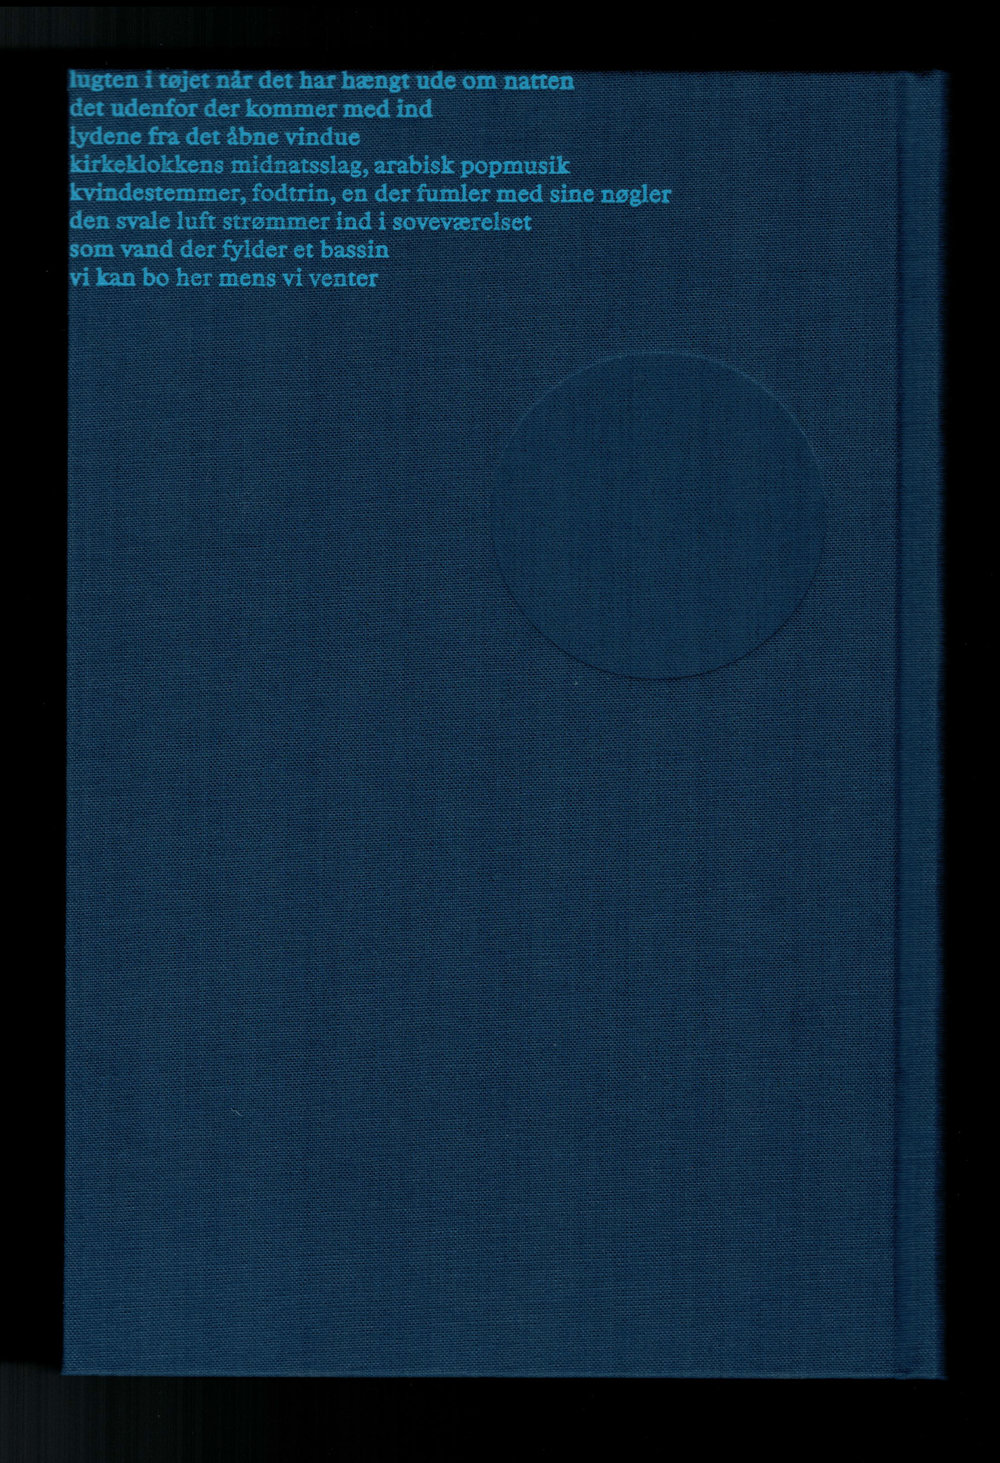 Anthology_Back cover.jpg